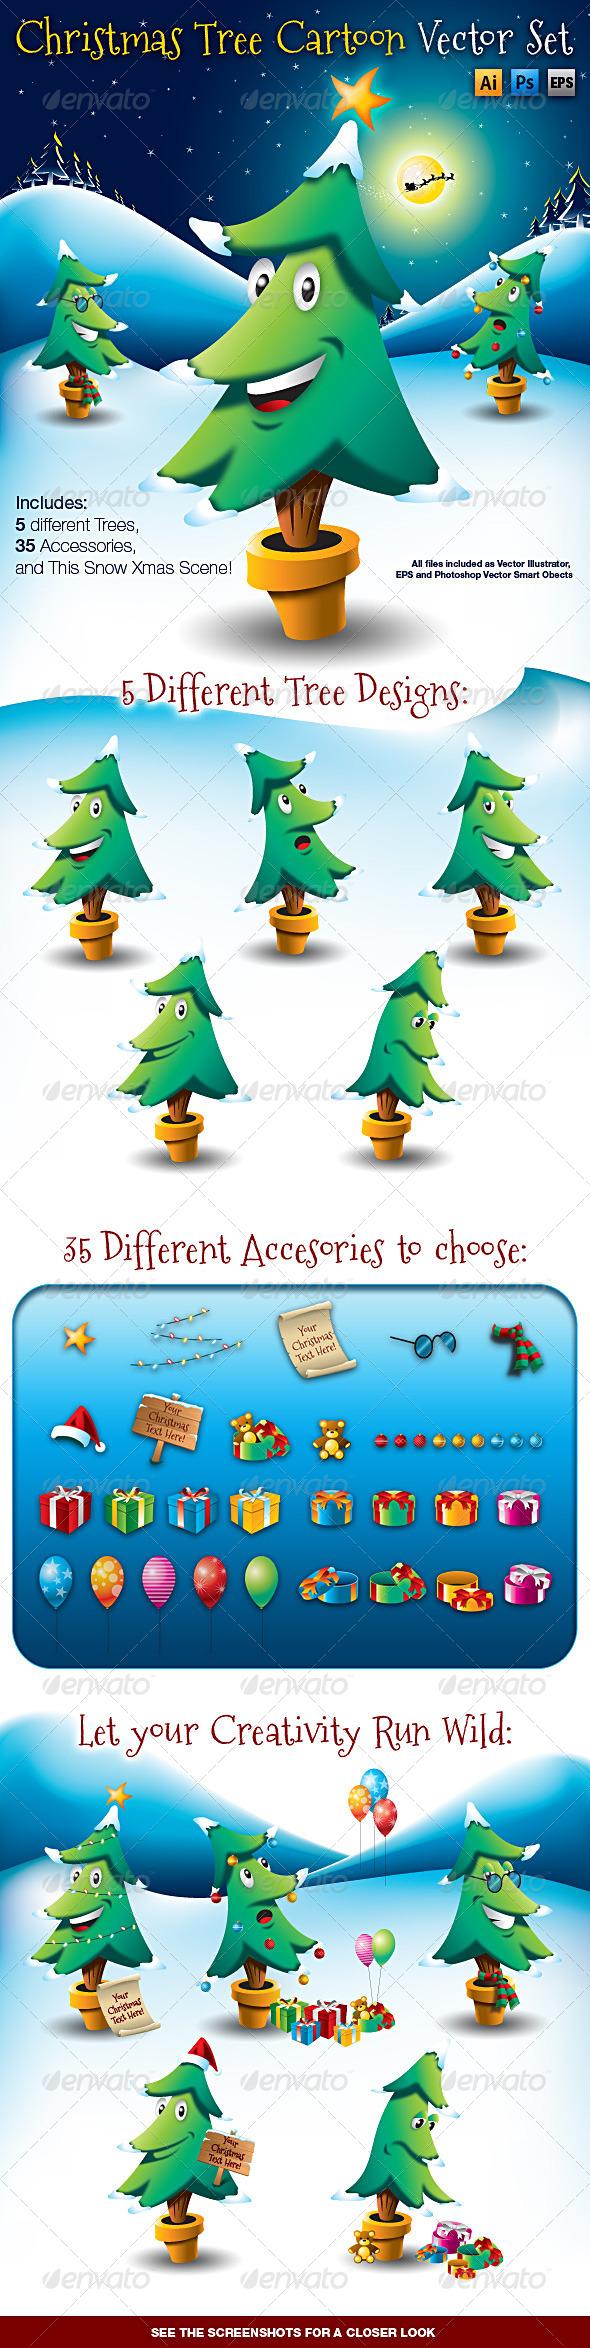 Christmas Tree Cartoon Vector Set - Christmas Seasons/Holidays